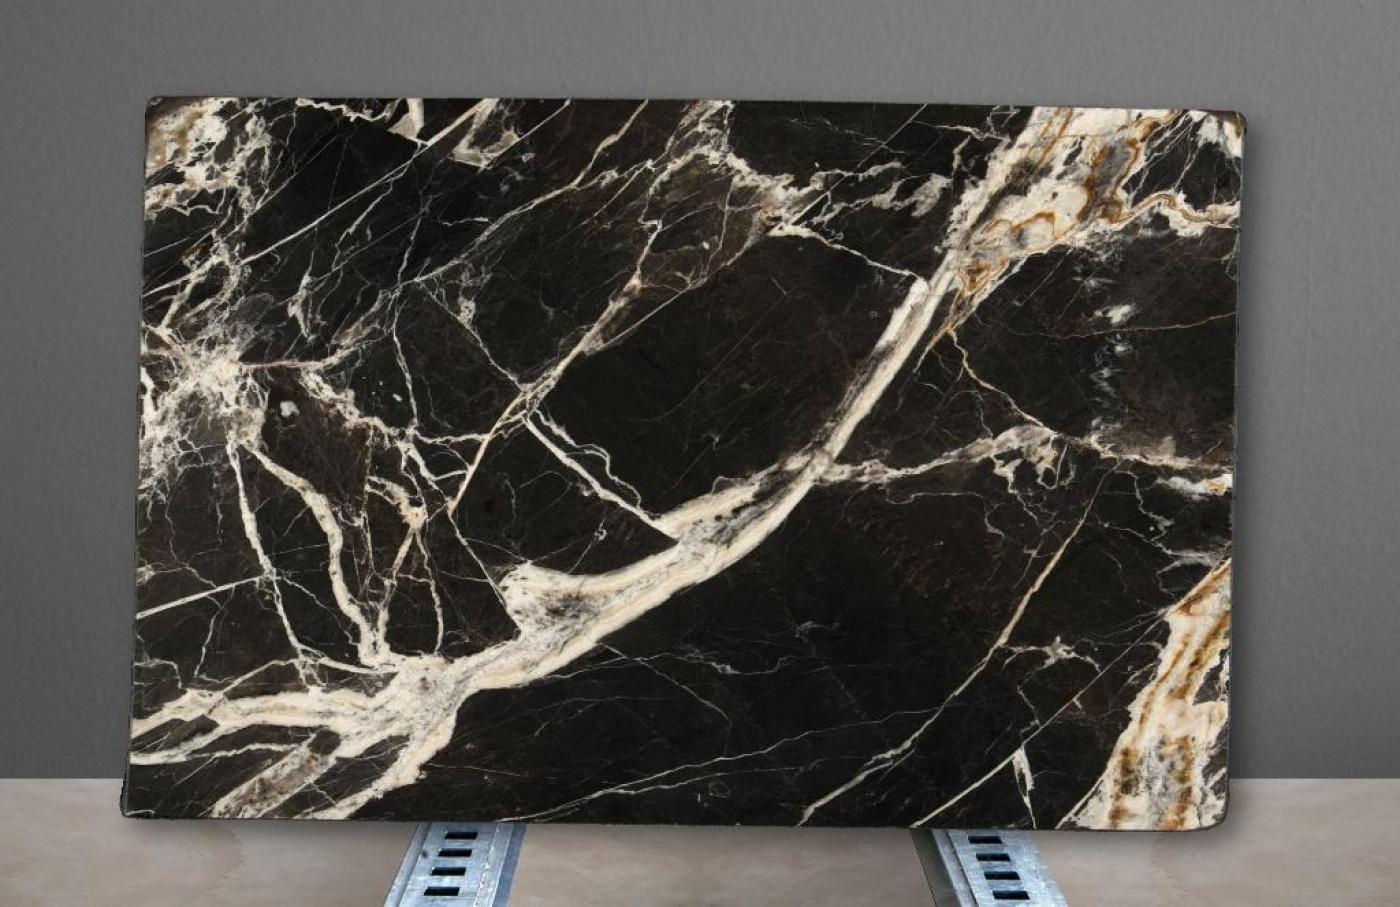 Calacatta Black Tranche de marbre noir veiné blanc et or